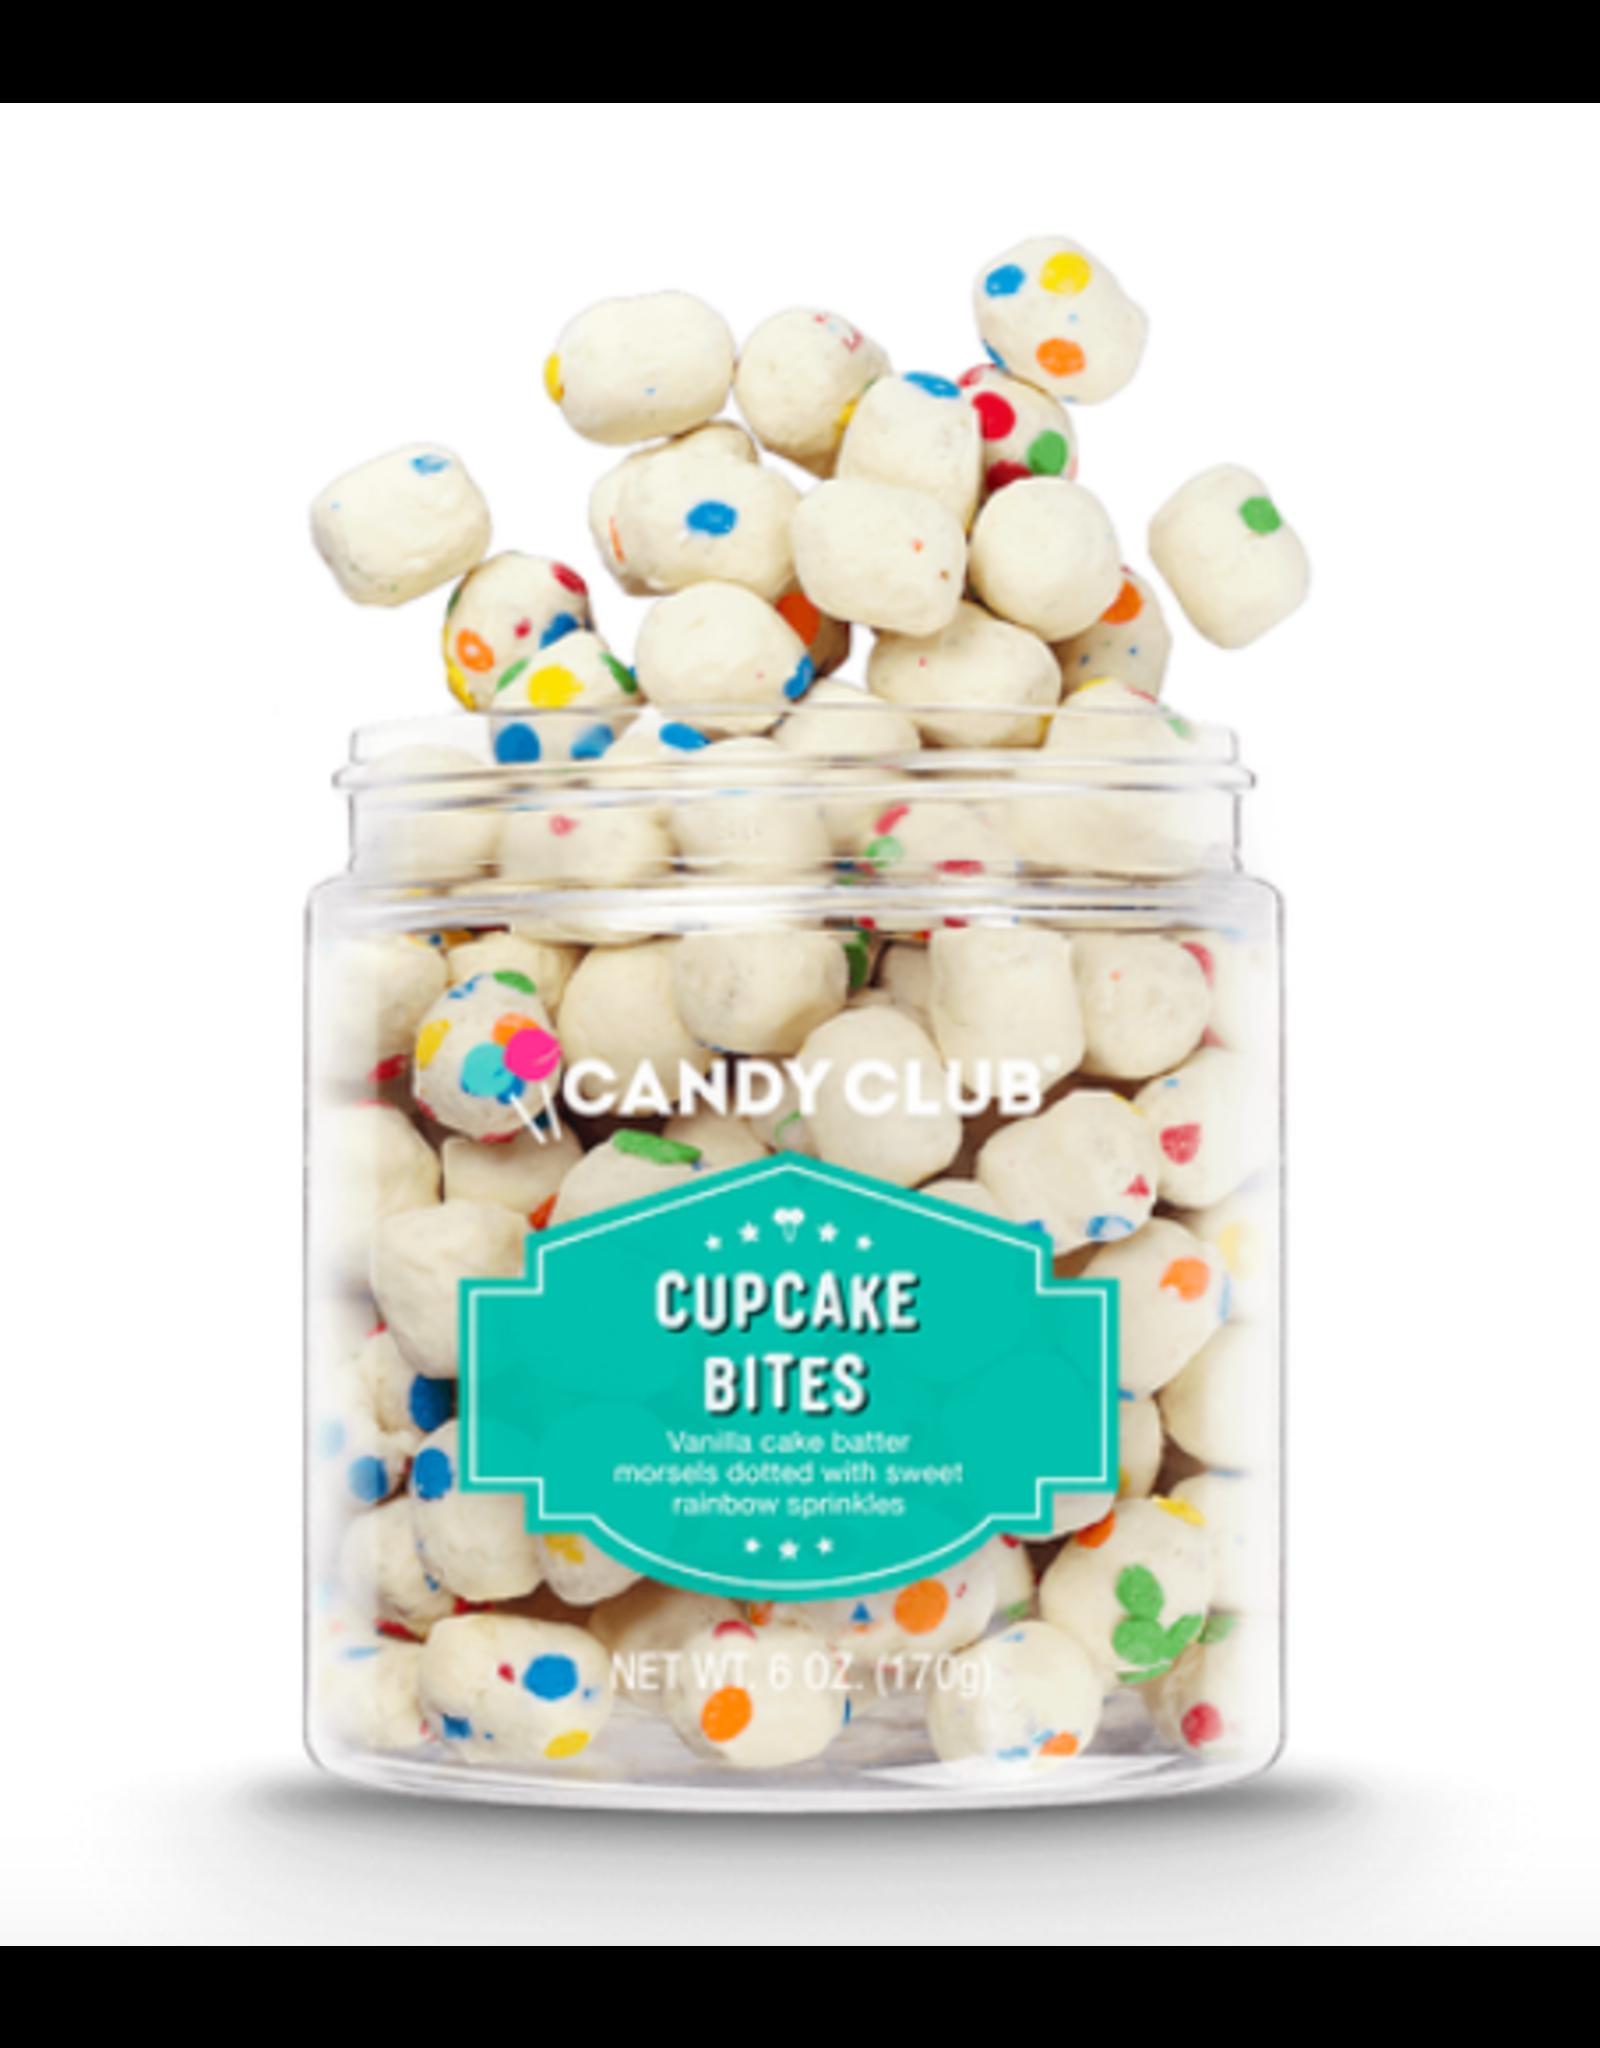 Candy Club Cupcake Bites Candy Jar